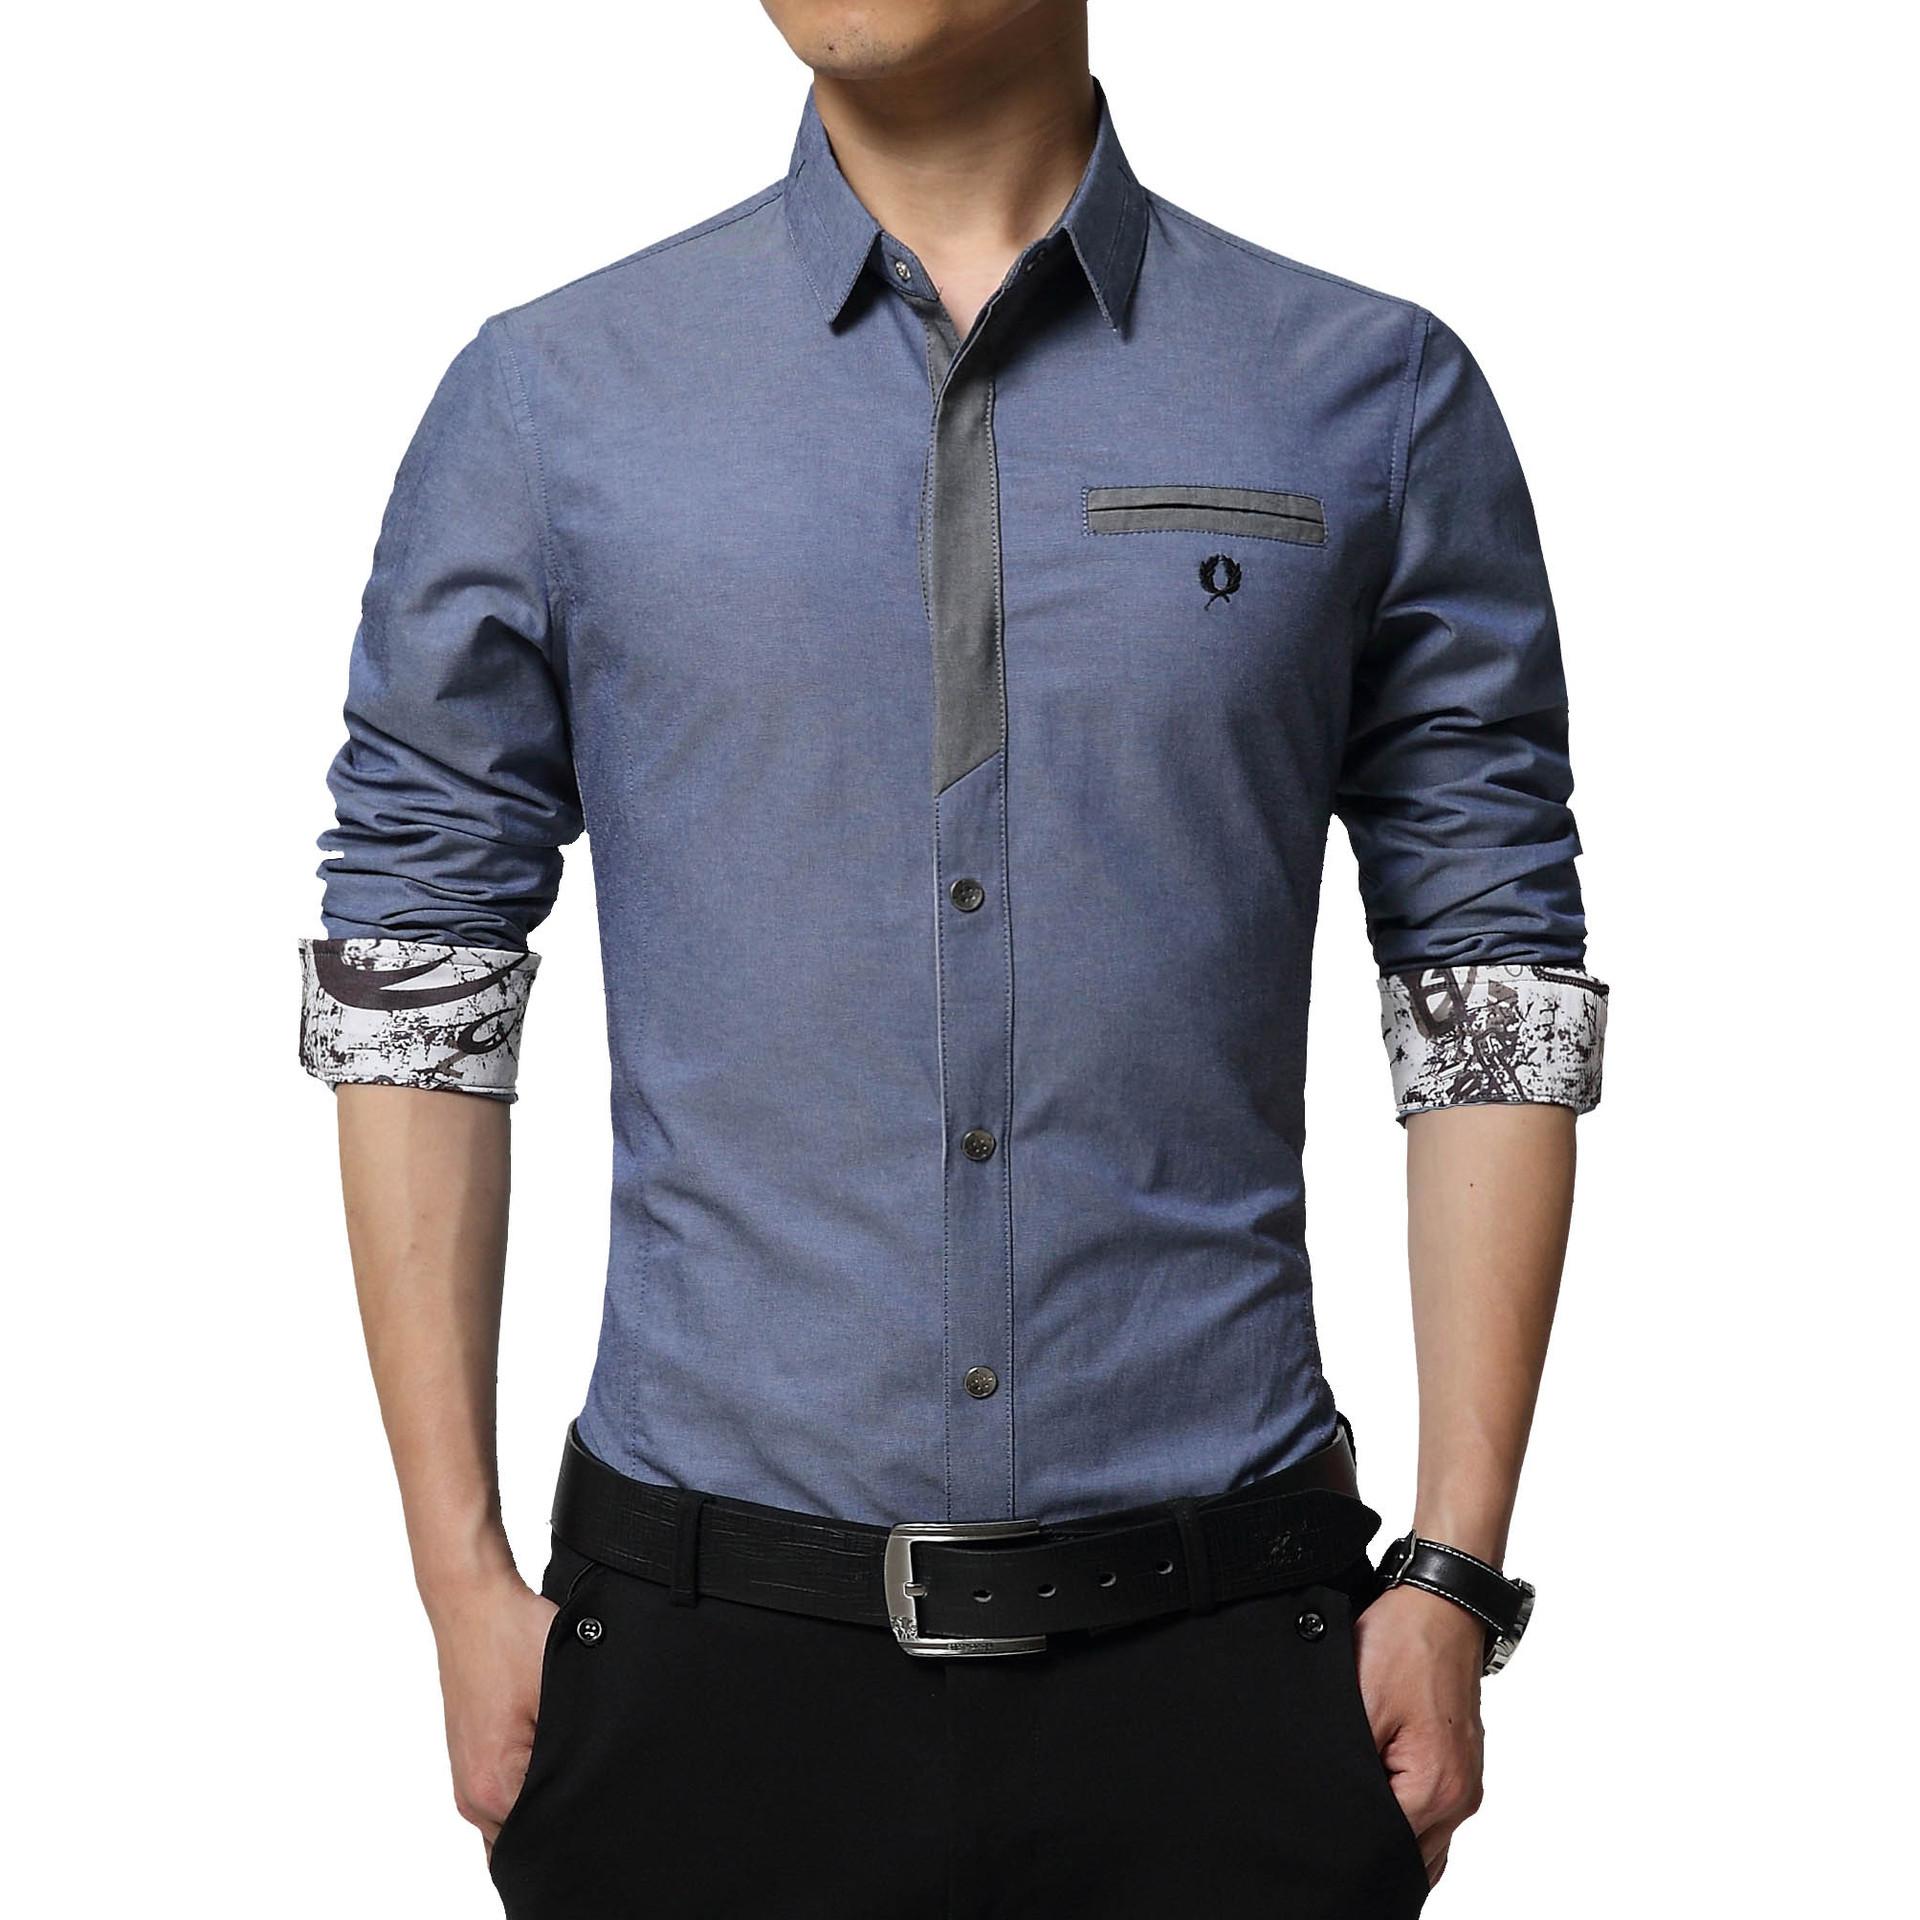 Floral Print Striped Dress Men Shirt Uniform Mens Long Sleeve Slim Fit Top Vintage Cotton Button Down Shirts Camisa Masculina 41